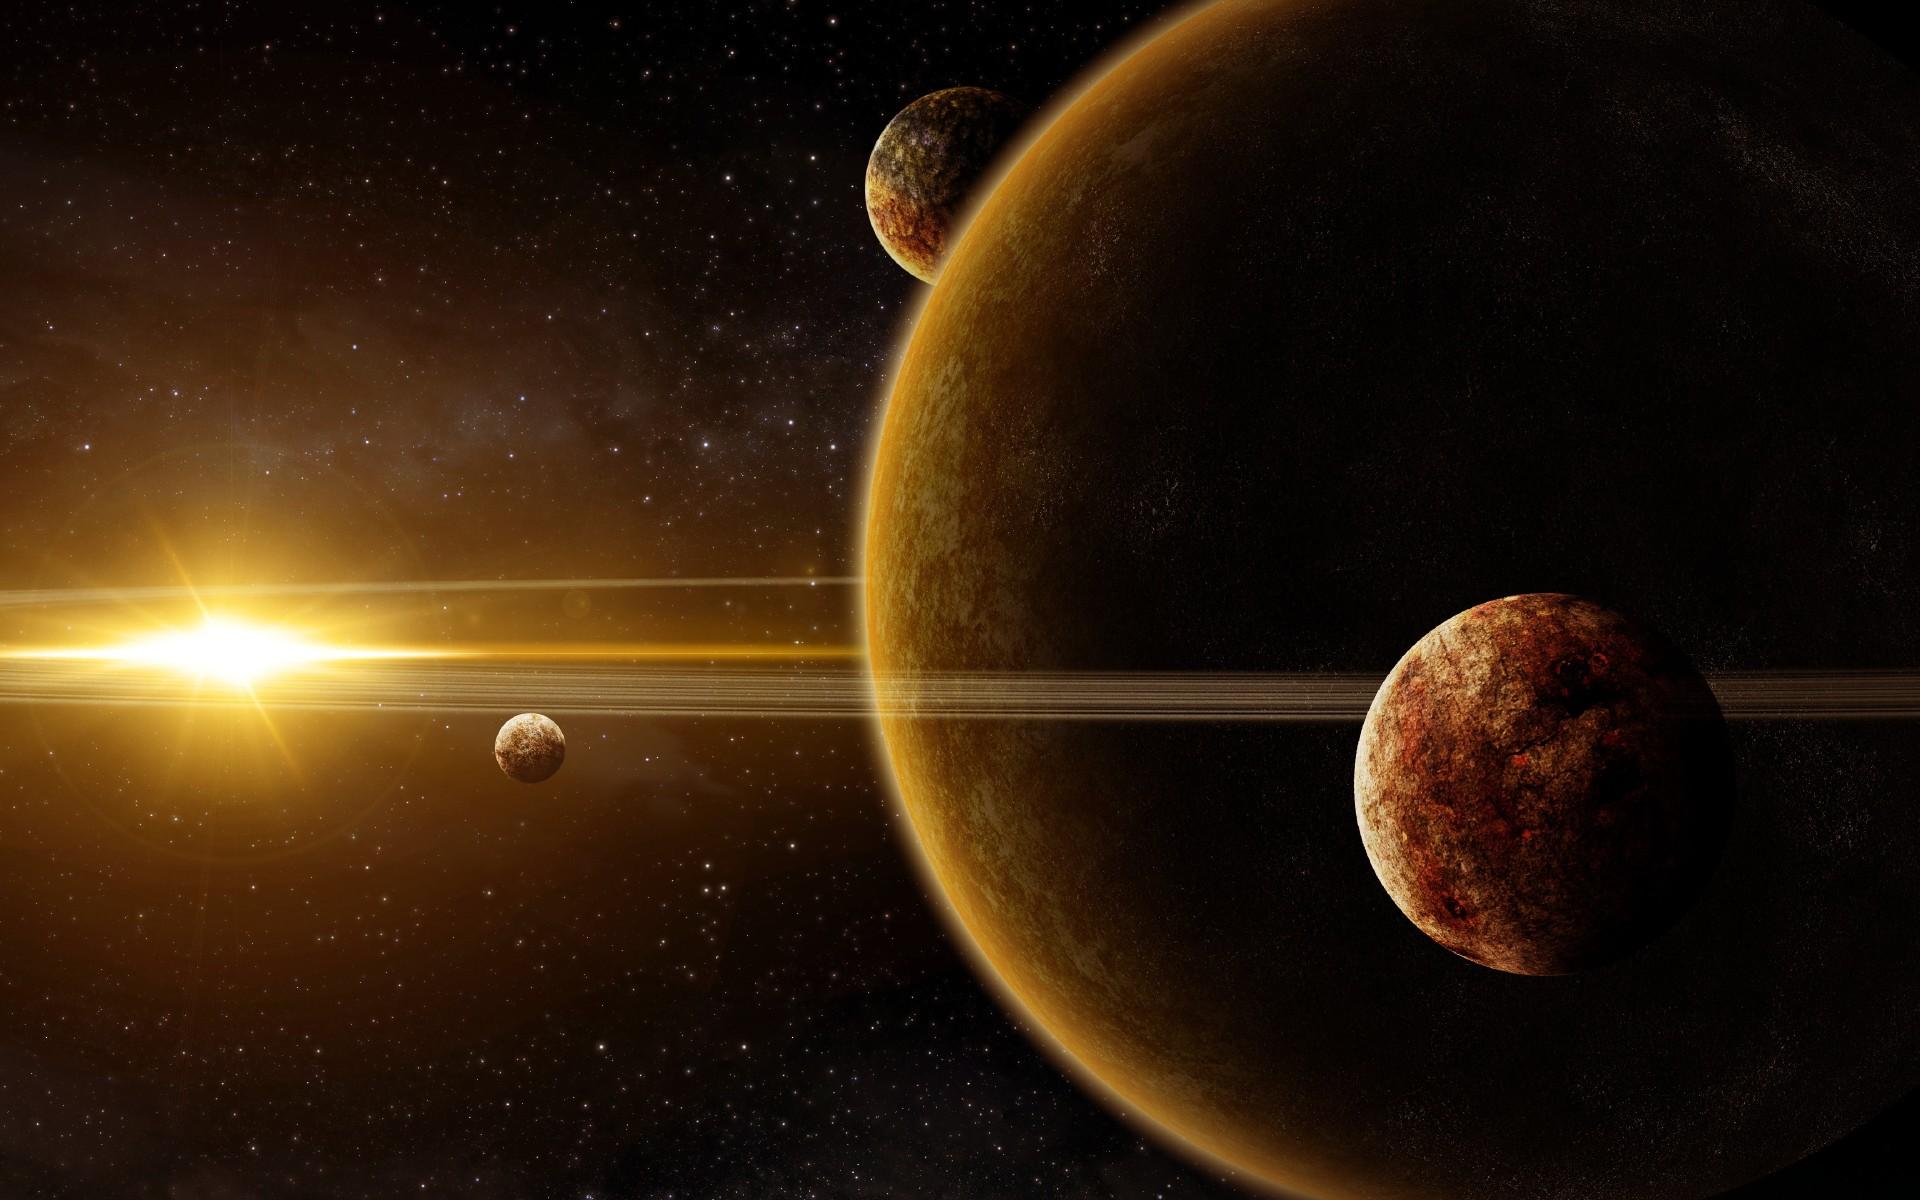 планета гигант с кольцами, спутники, яркая звезда